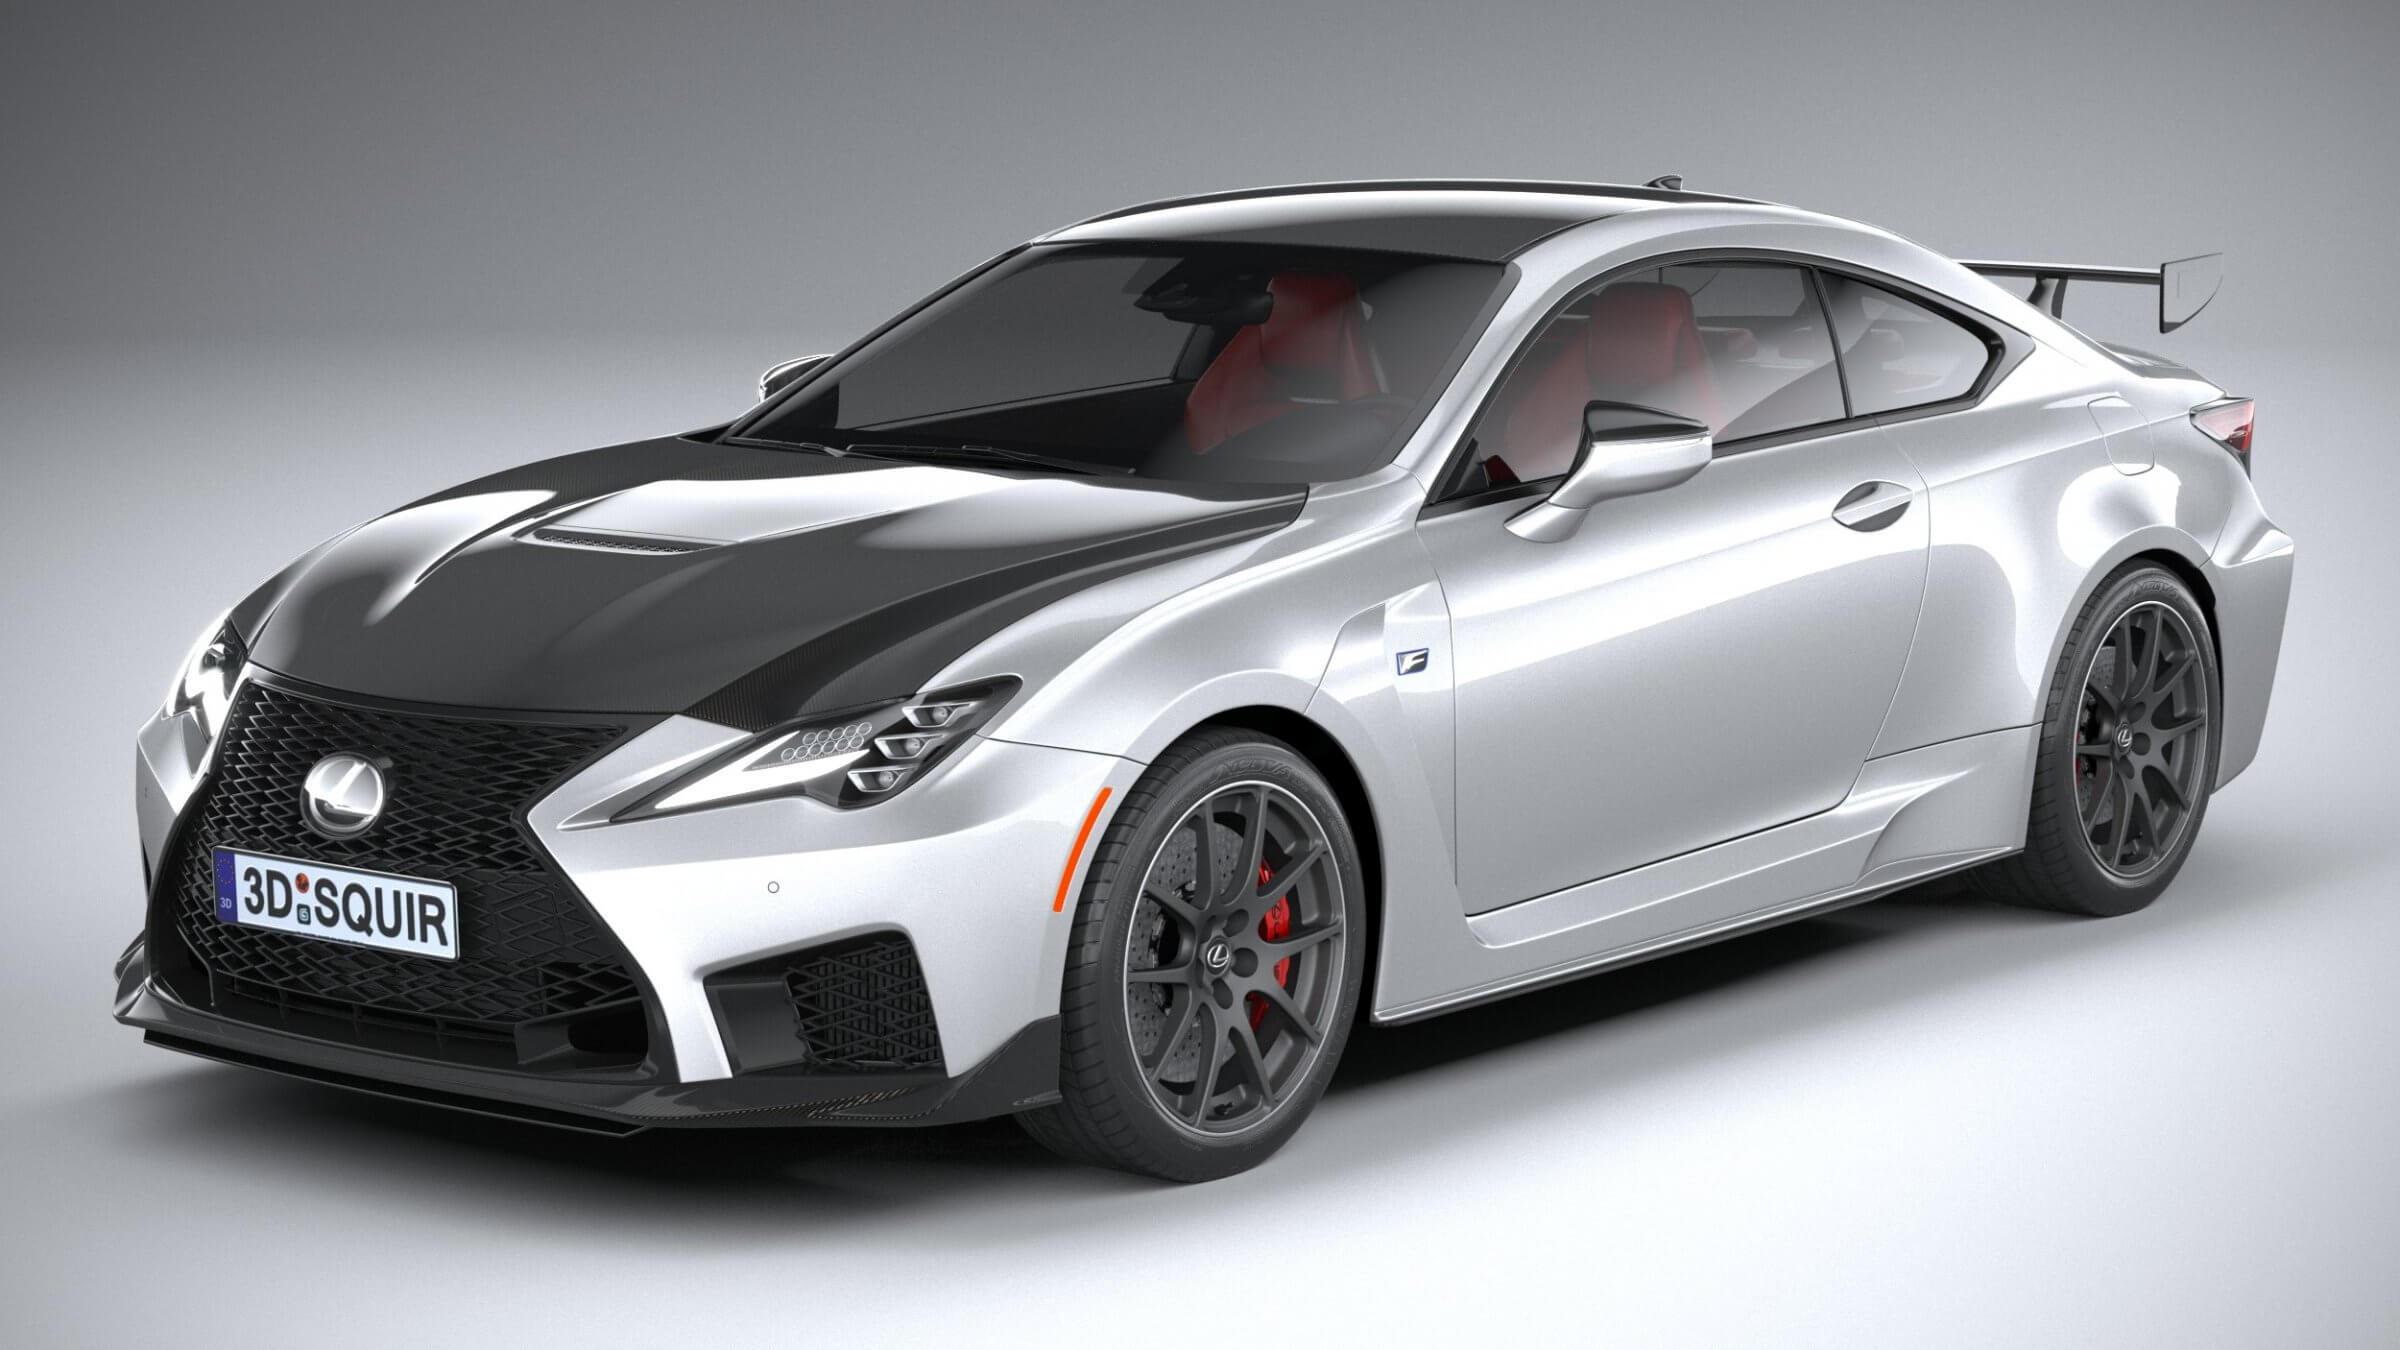 Lexus Rc F Track Edition 2020 3d Model